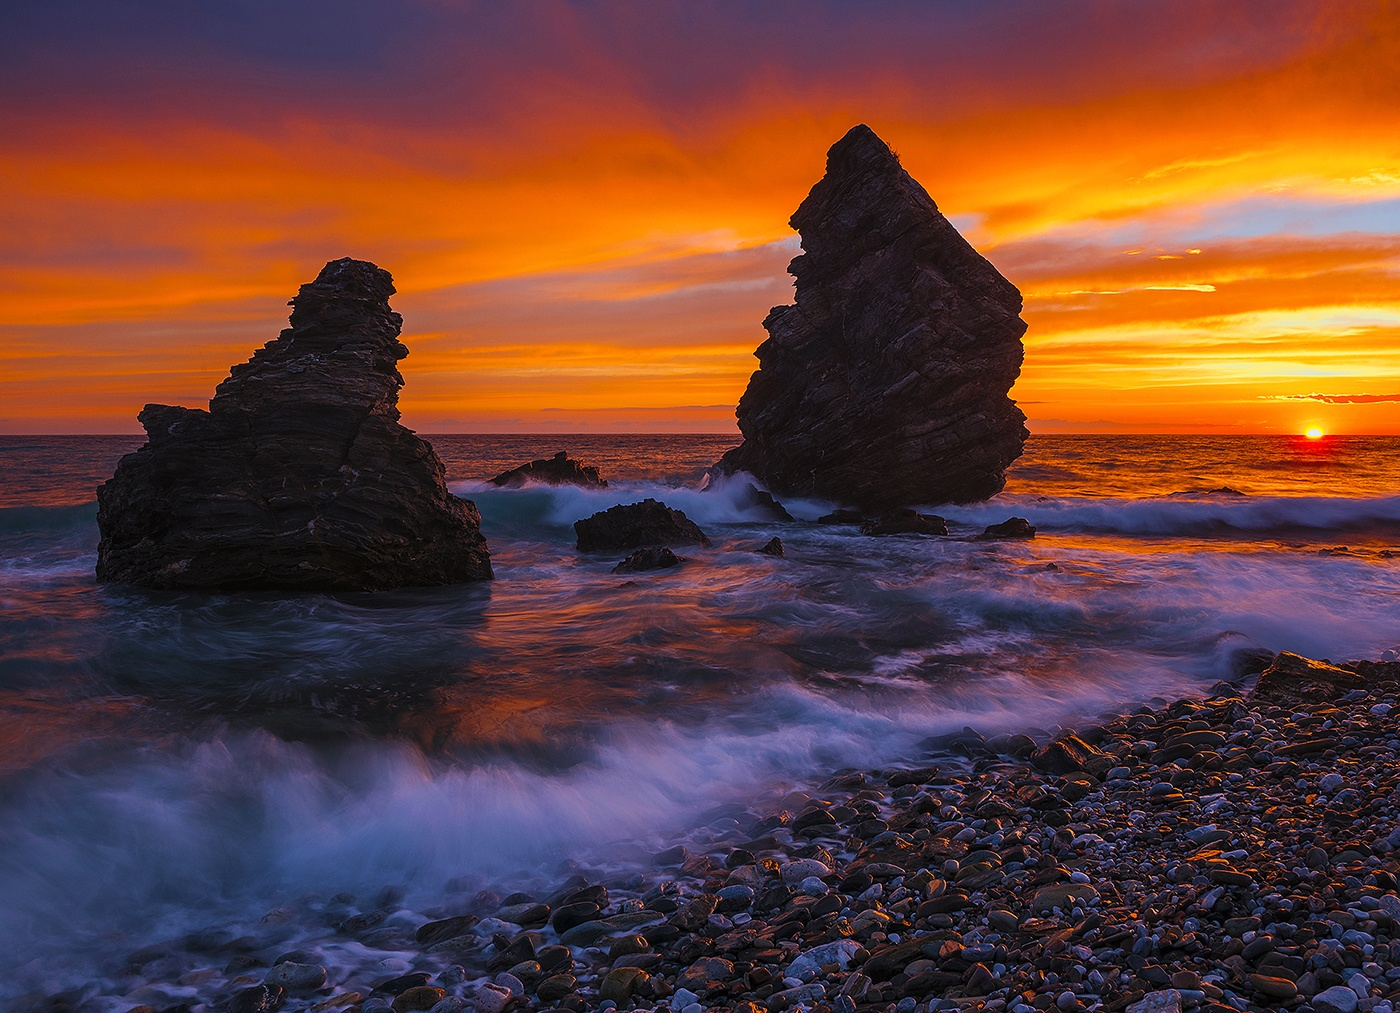 Maro / Cerro Gordo - On fire - Peter Manschot Al Andalus Photo Tour, Landscape photography photos prints workshops Andalusia Spain